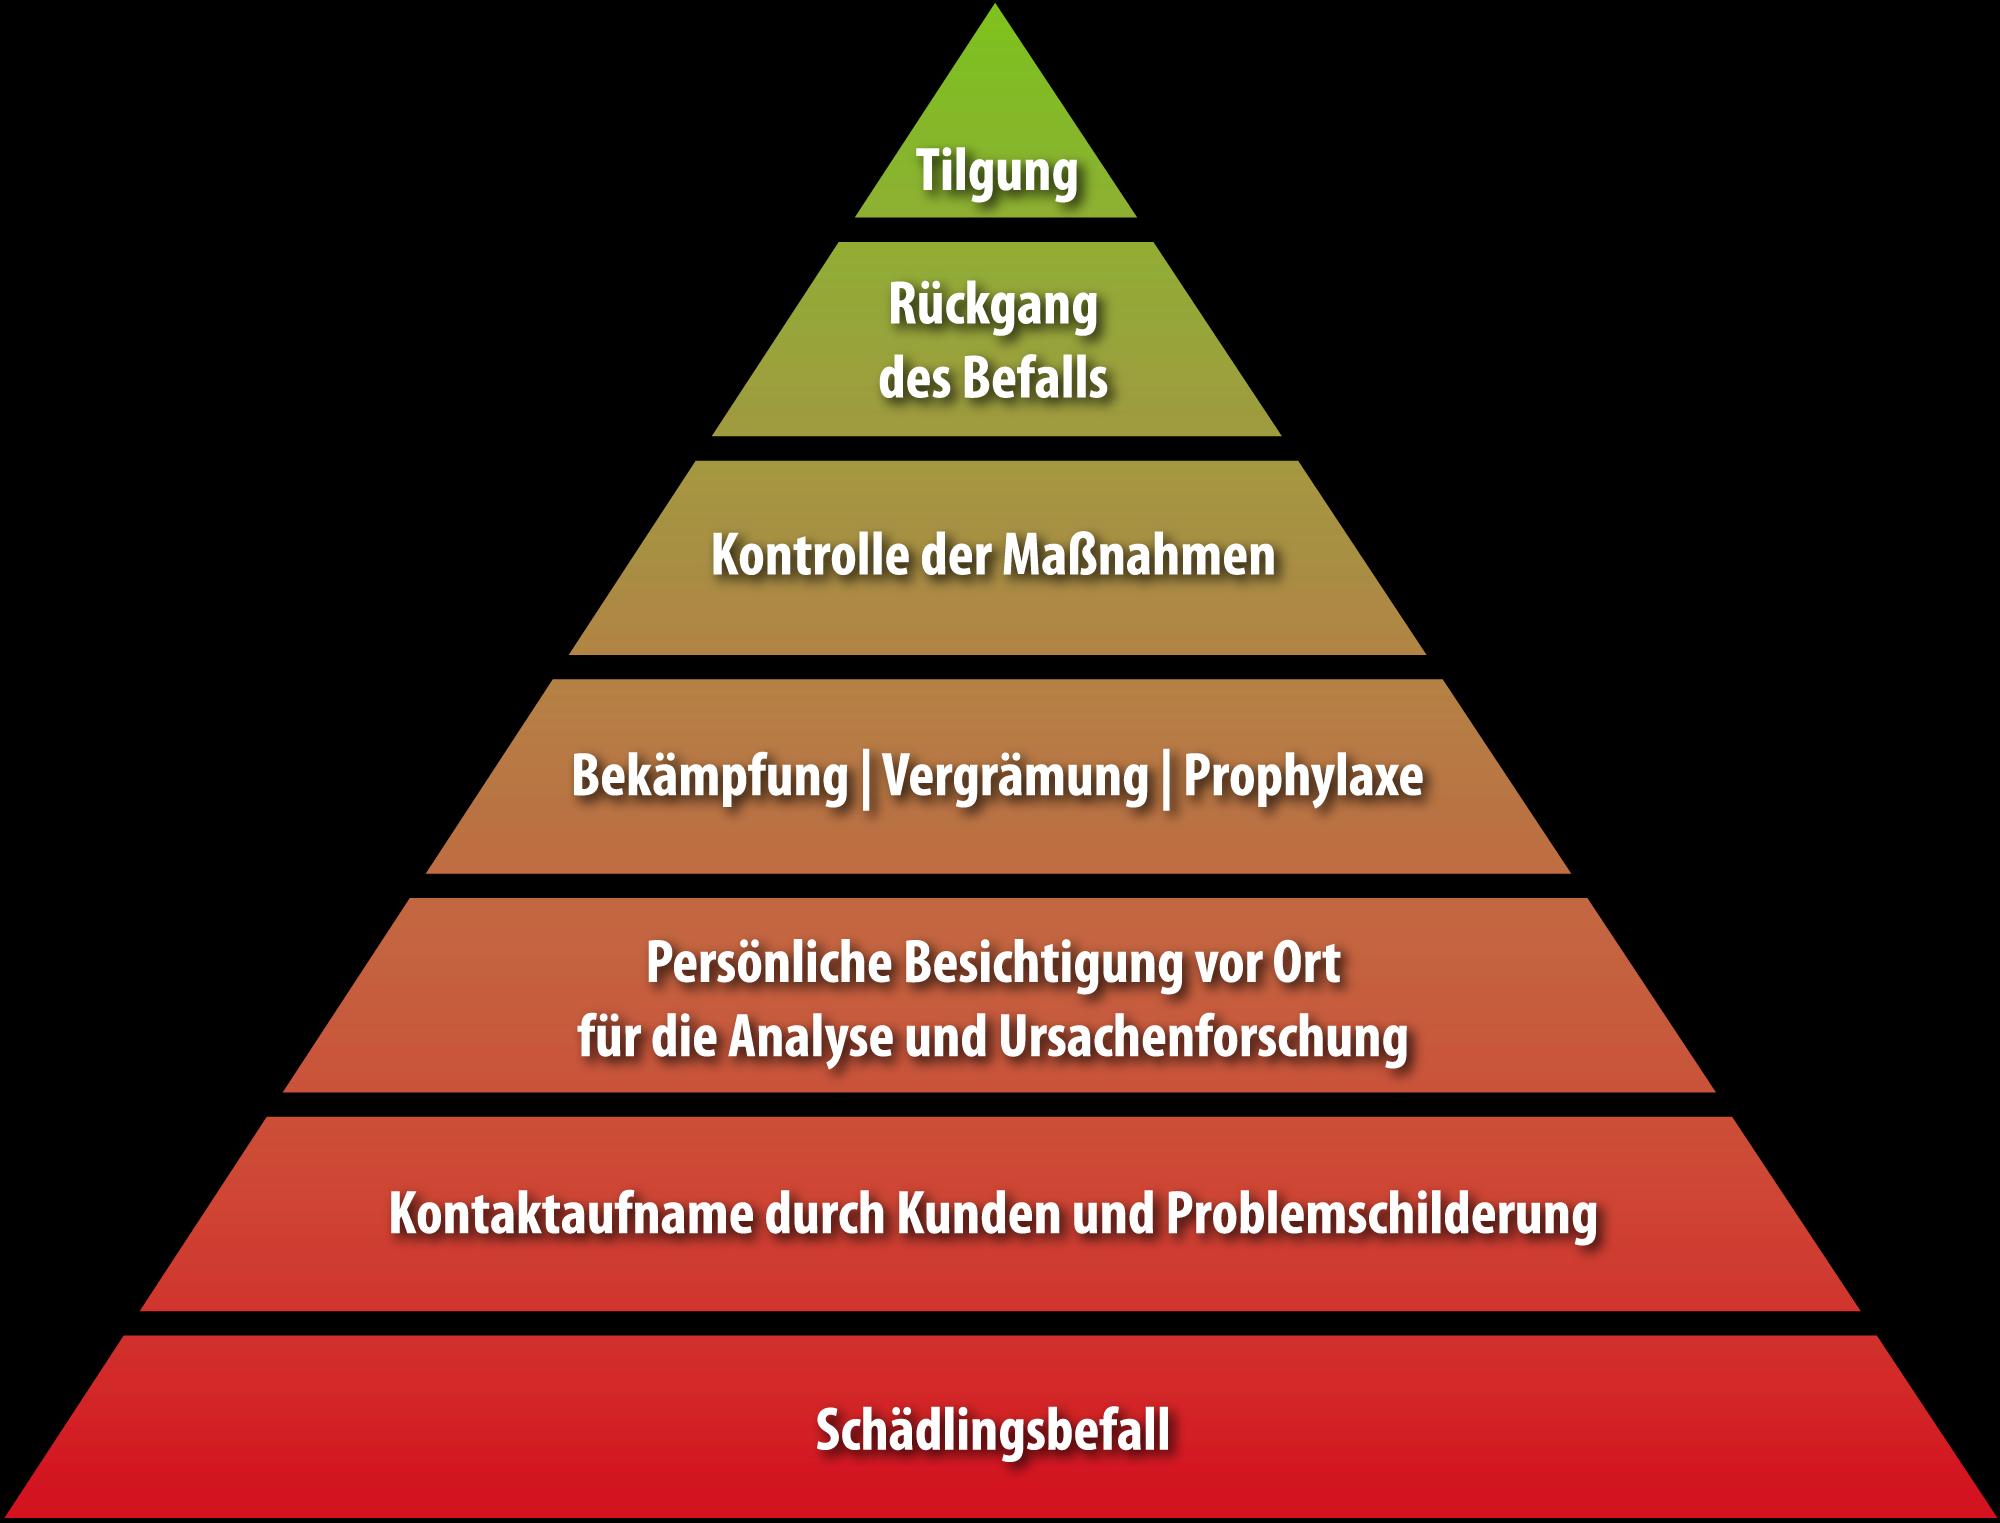 Bekämpfungspyramide